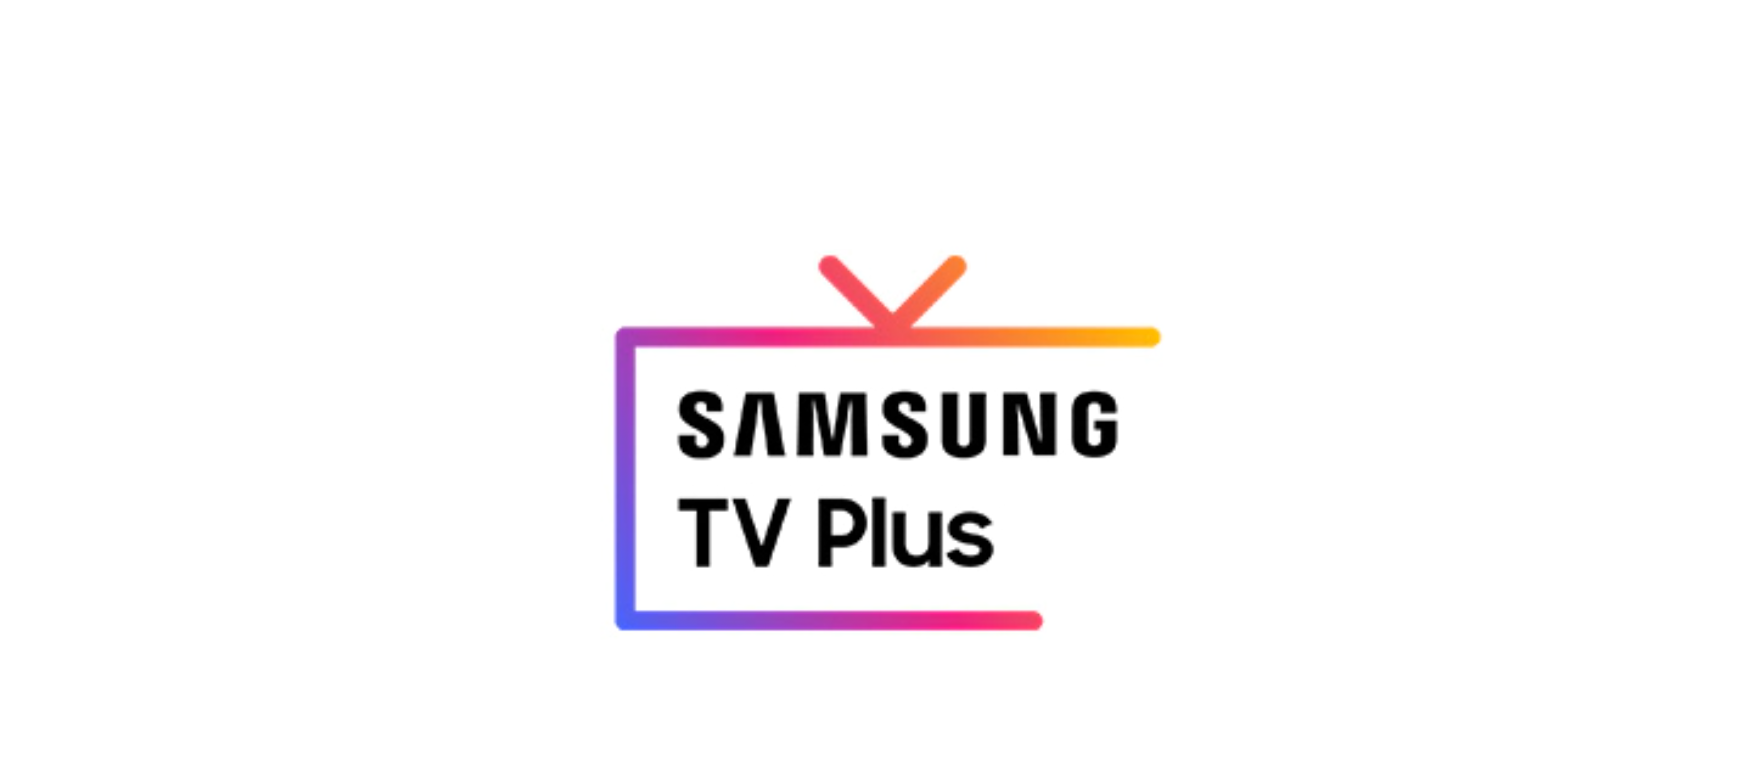 samsung-tv-plus-apk-download